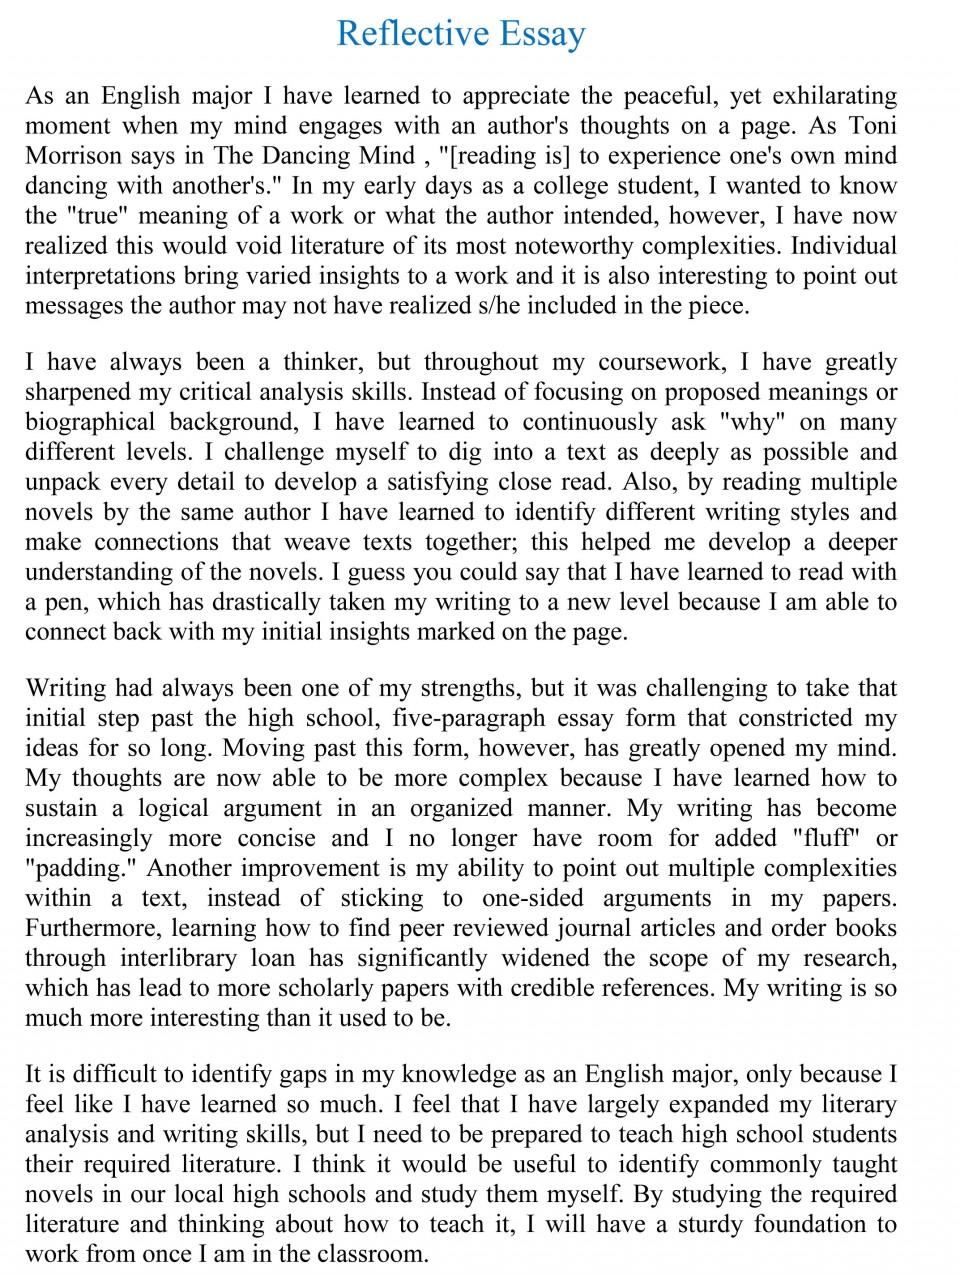 003 Reflective Essay Introduction Example Unbelievable Academic Good 960